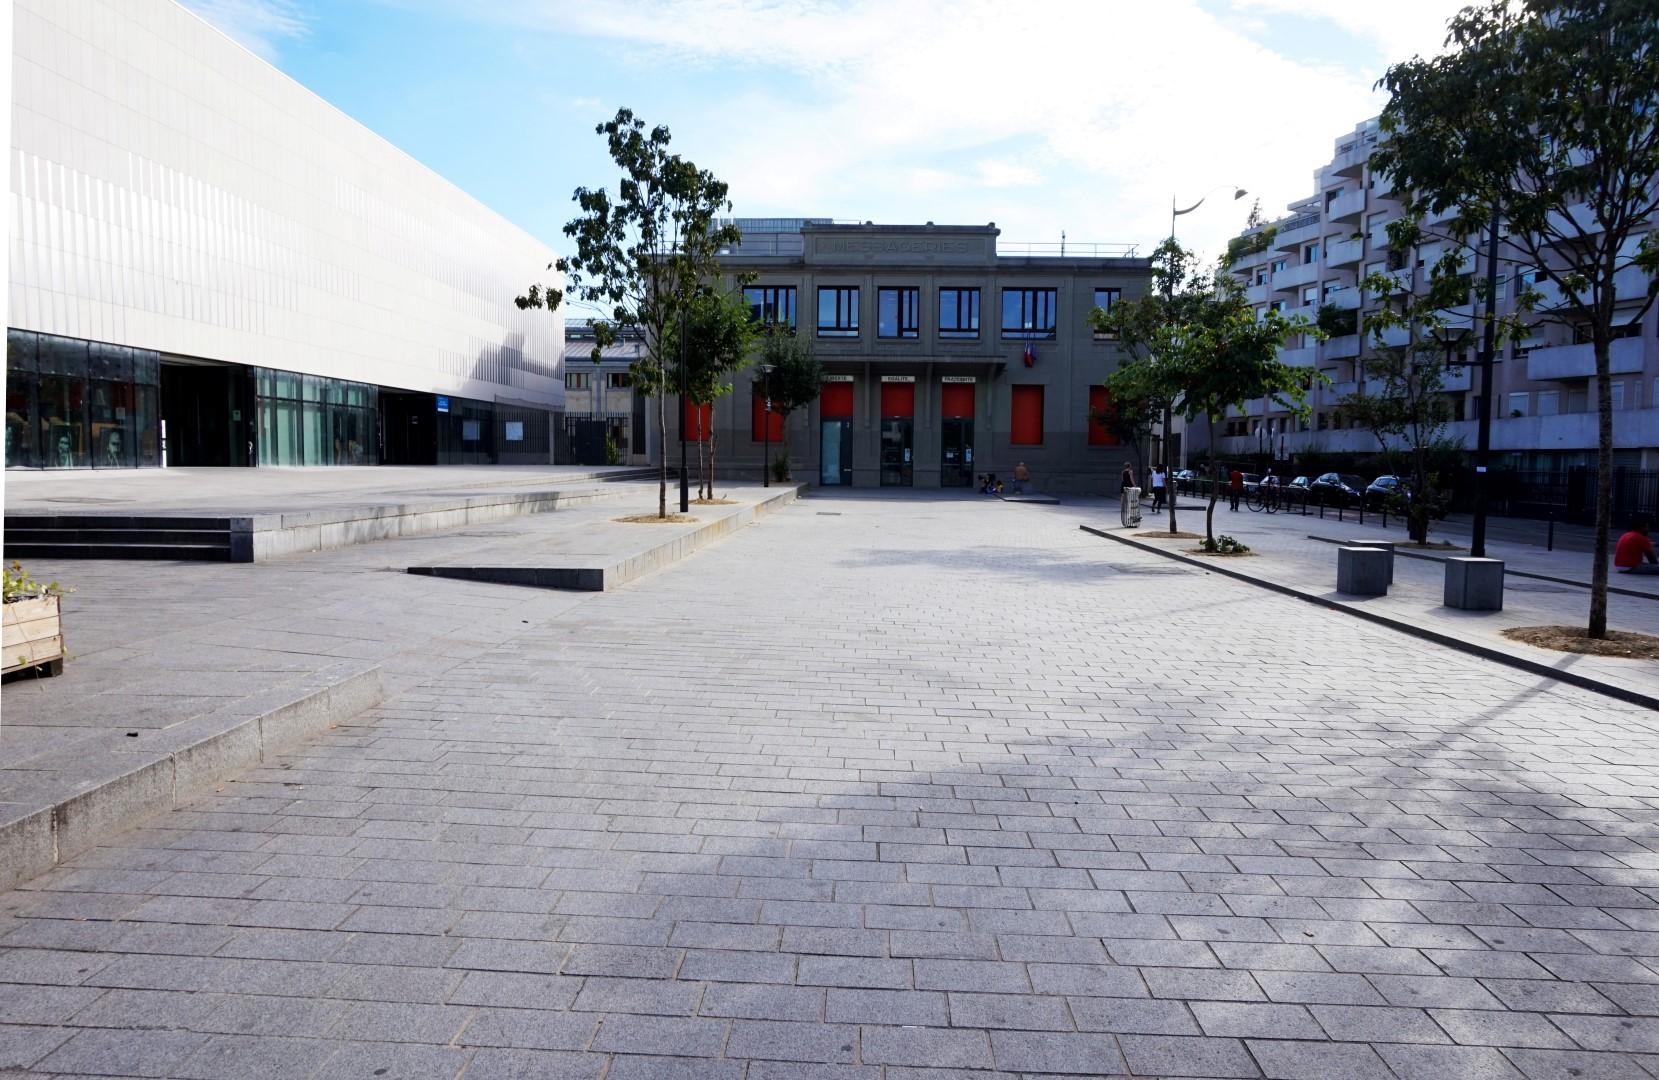 La halle Pajol - Paris 18e